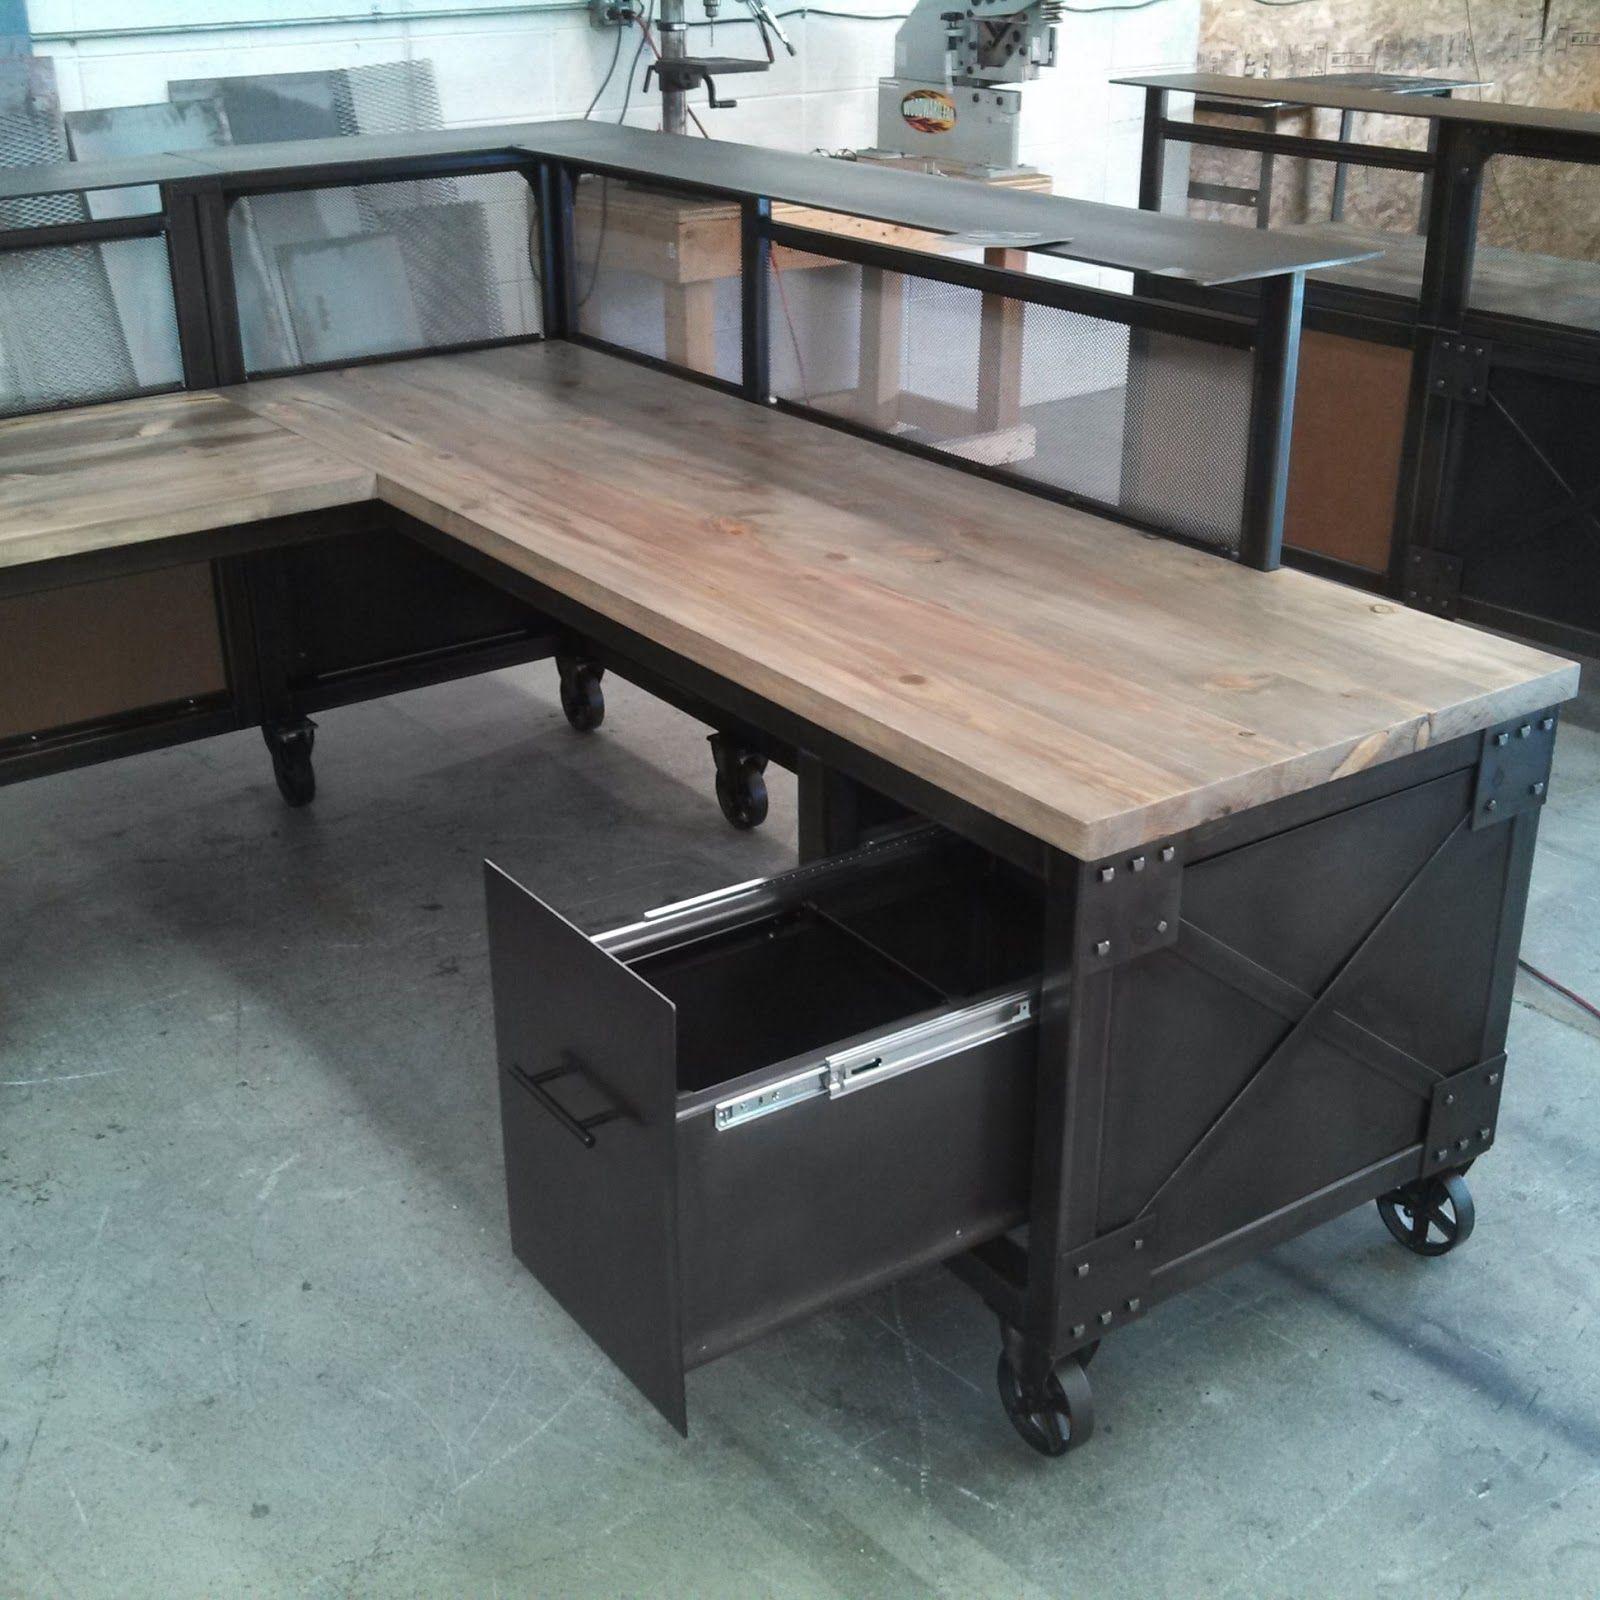 Img 20131030 183649 Jpg 1600 1600 Wood And Metal Desk Custom